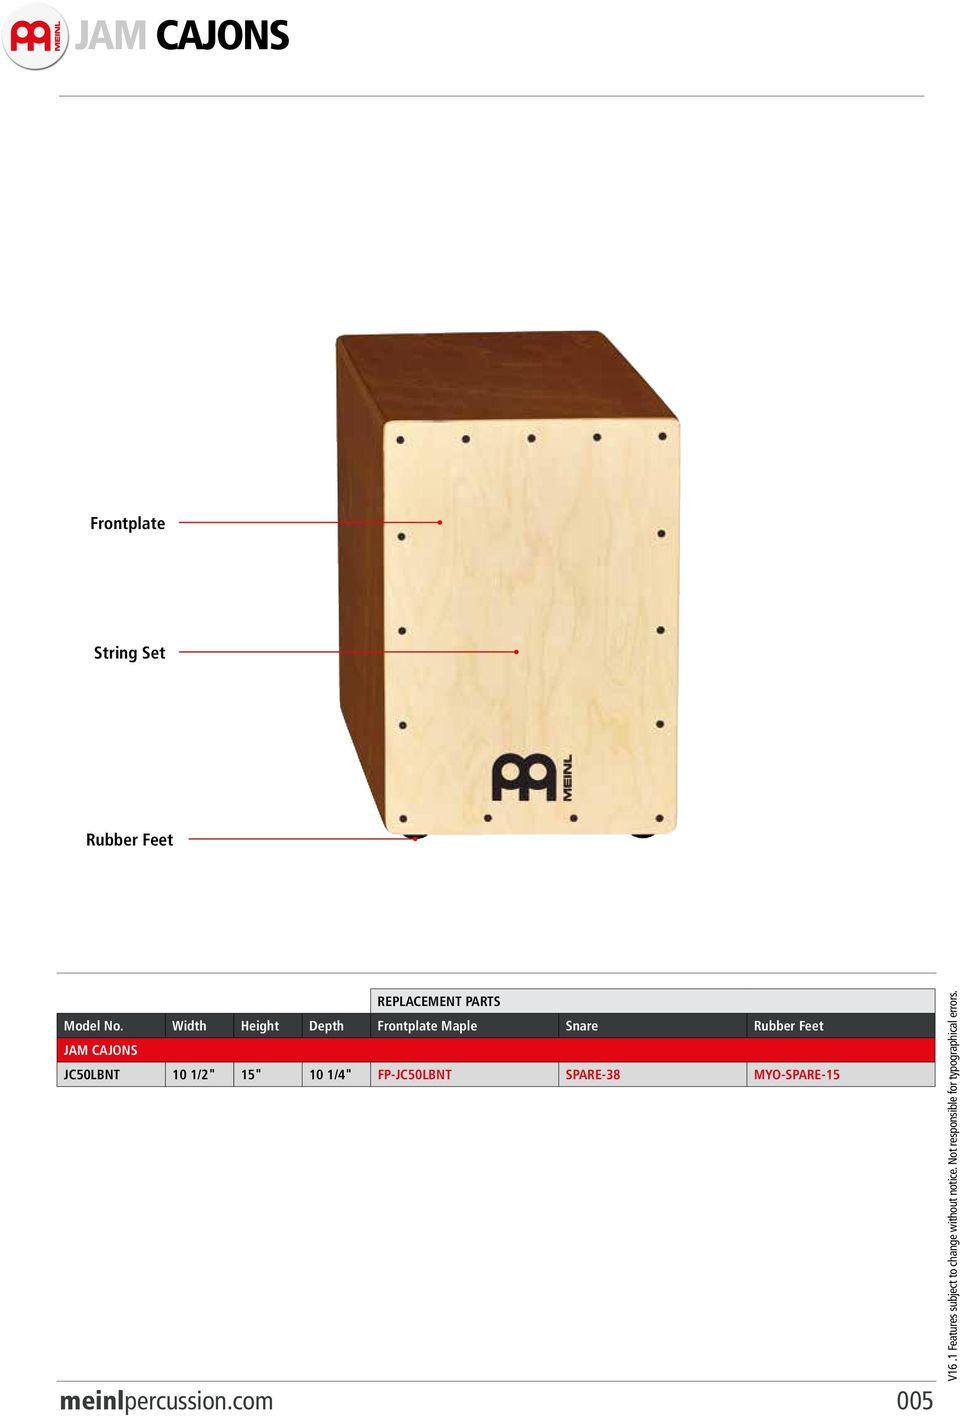 hight resolution of rubber feet jam cajons jc50lbnt 10 1 2 15 10 1 4